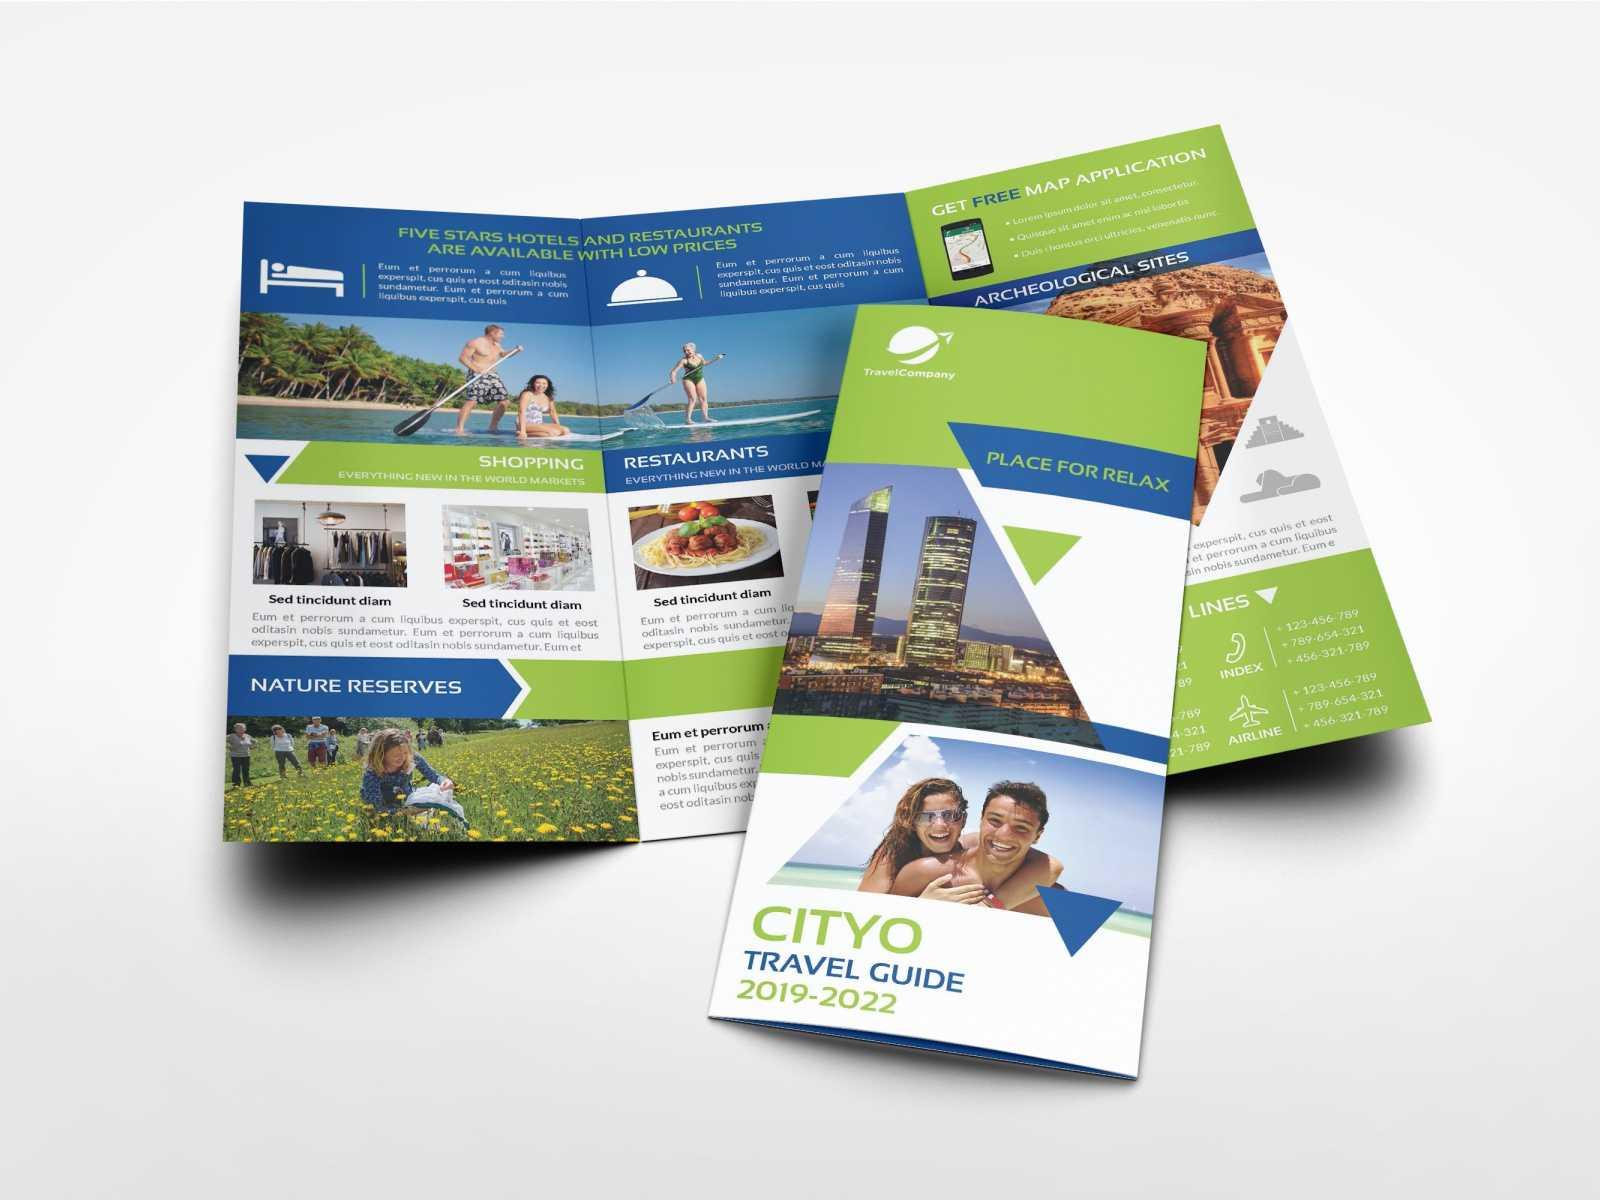 Travel Guide Tri Fold Brochure Templateowpictures On Regarding Travel Guide Brochure Template